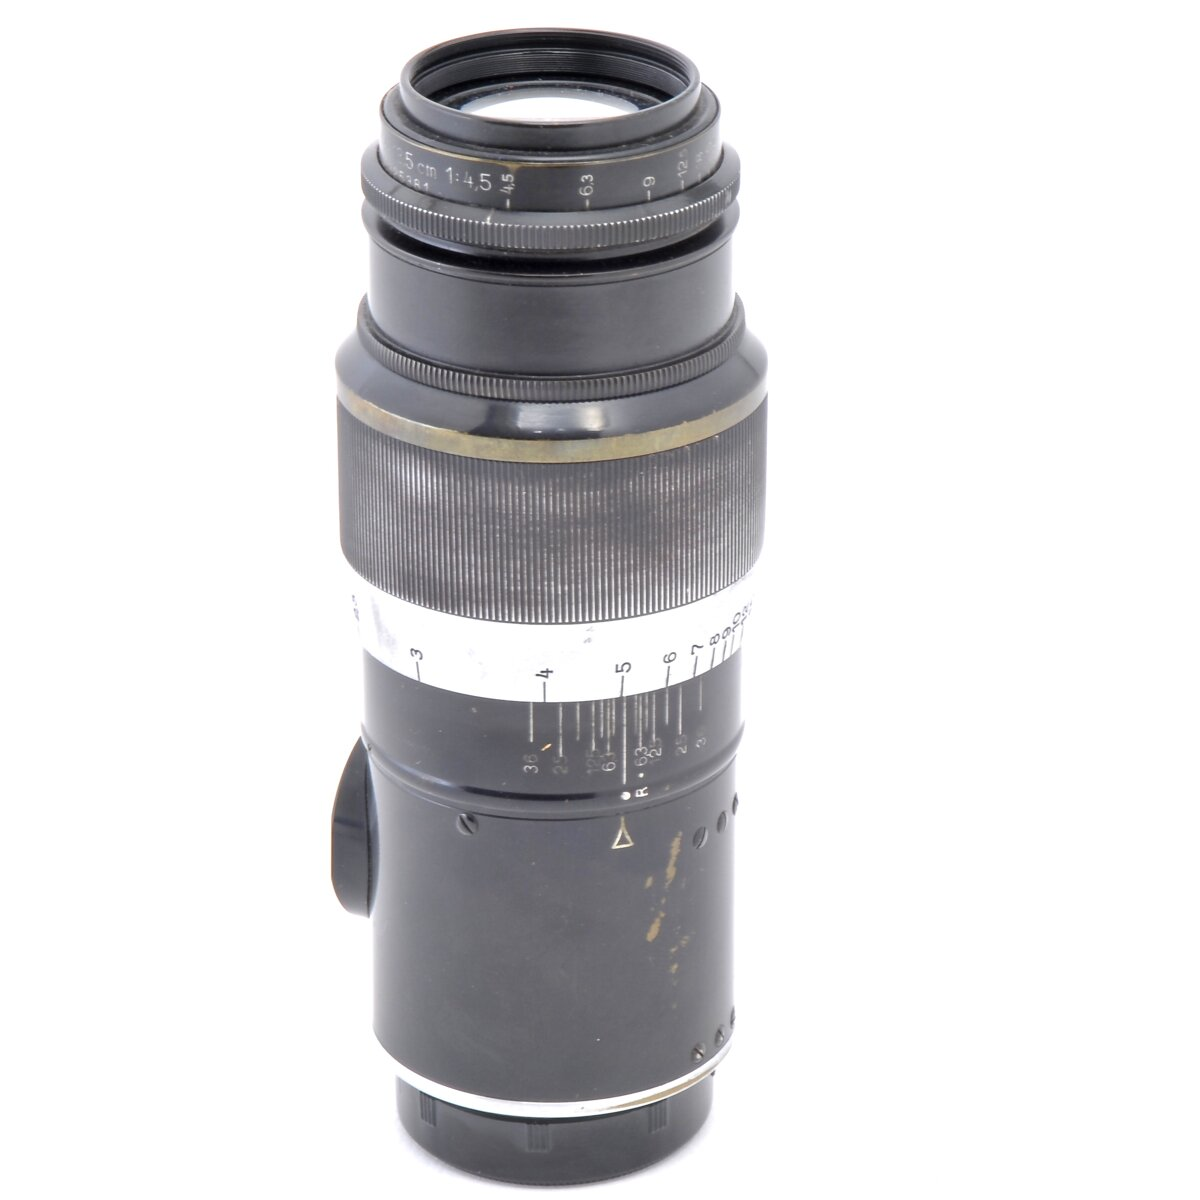 Leica Hektor 13,5cm 1:4,5 black M39